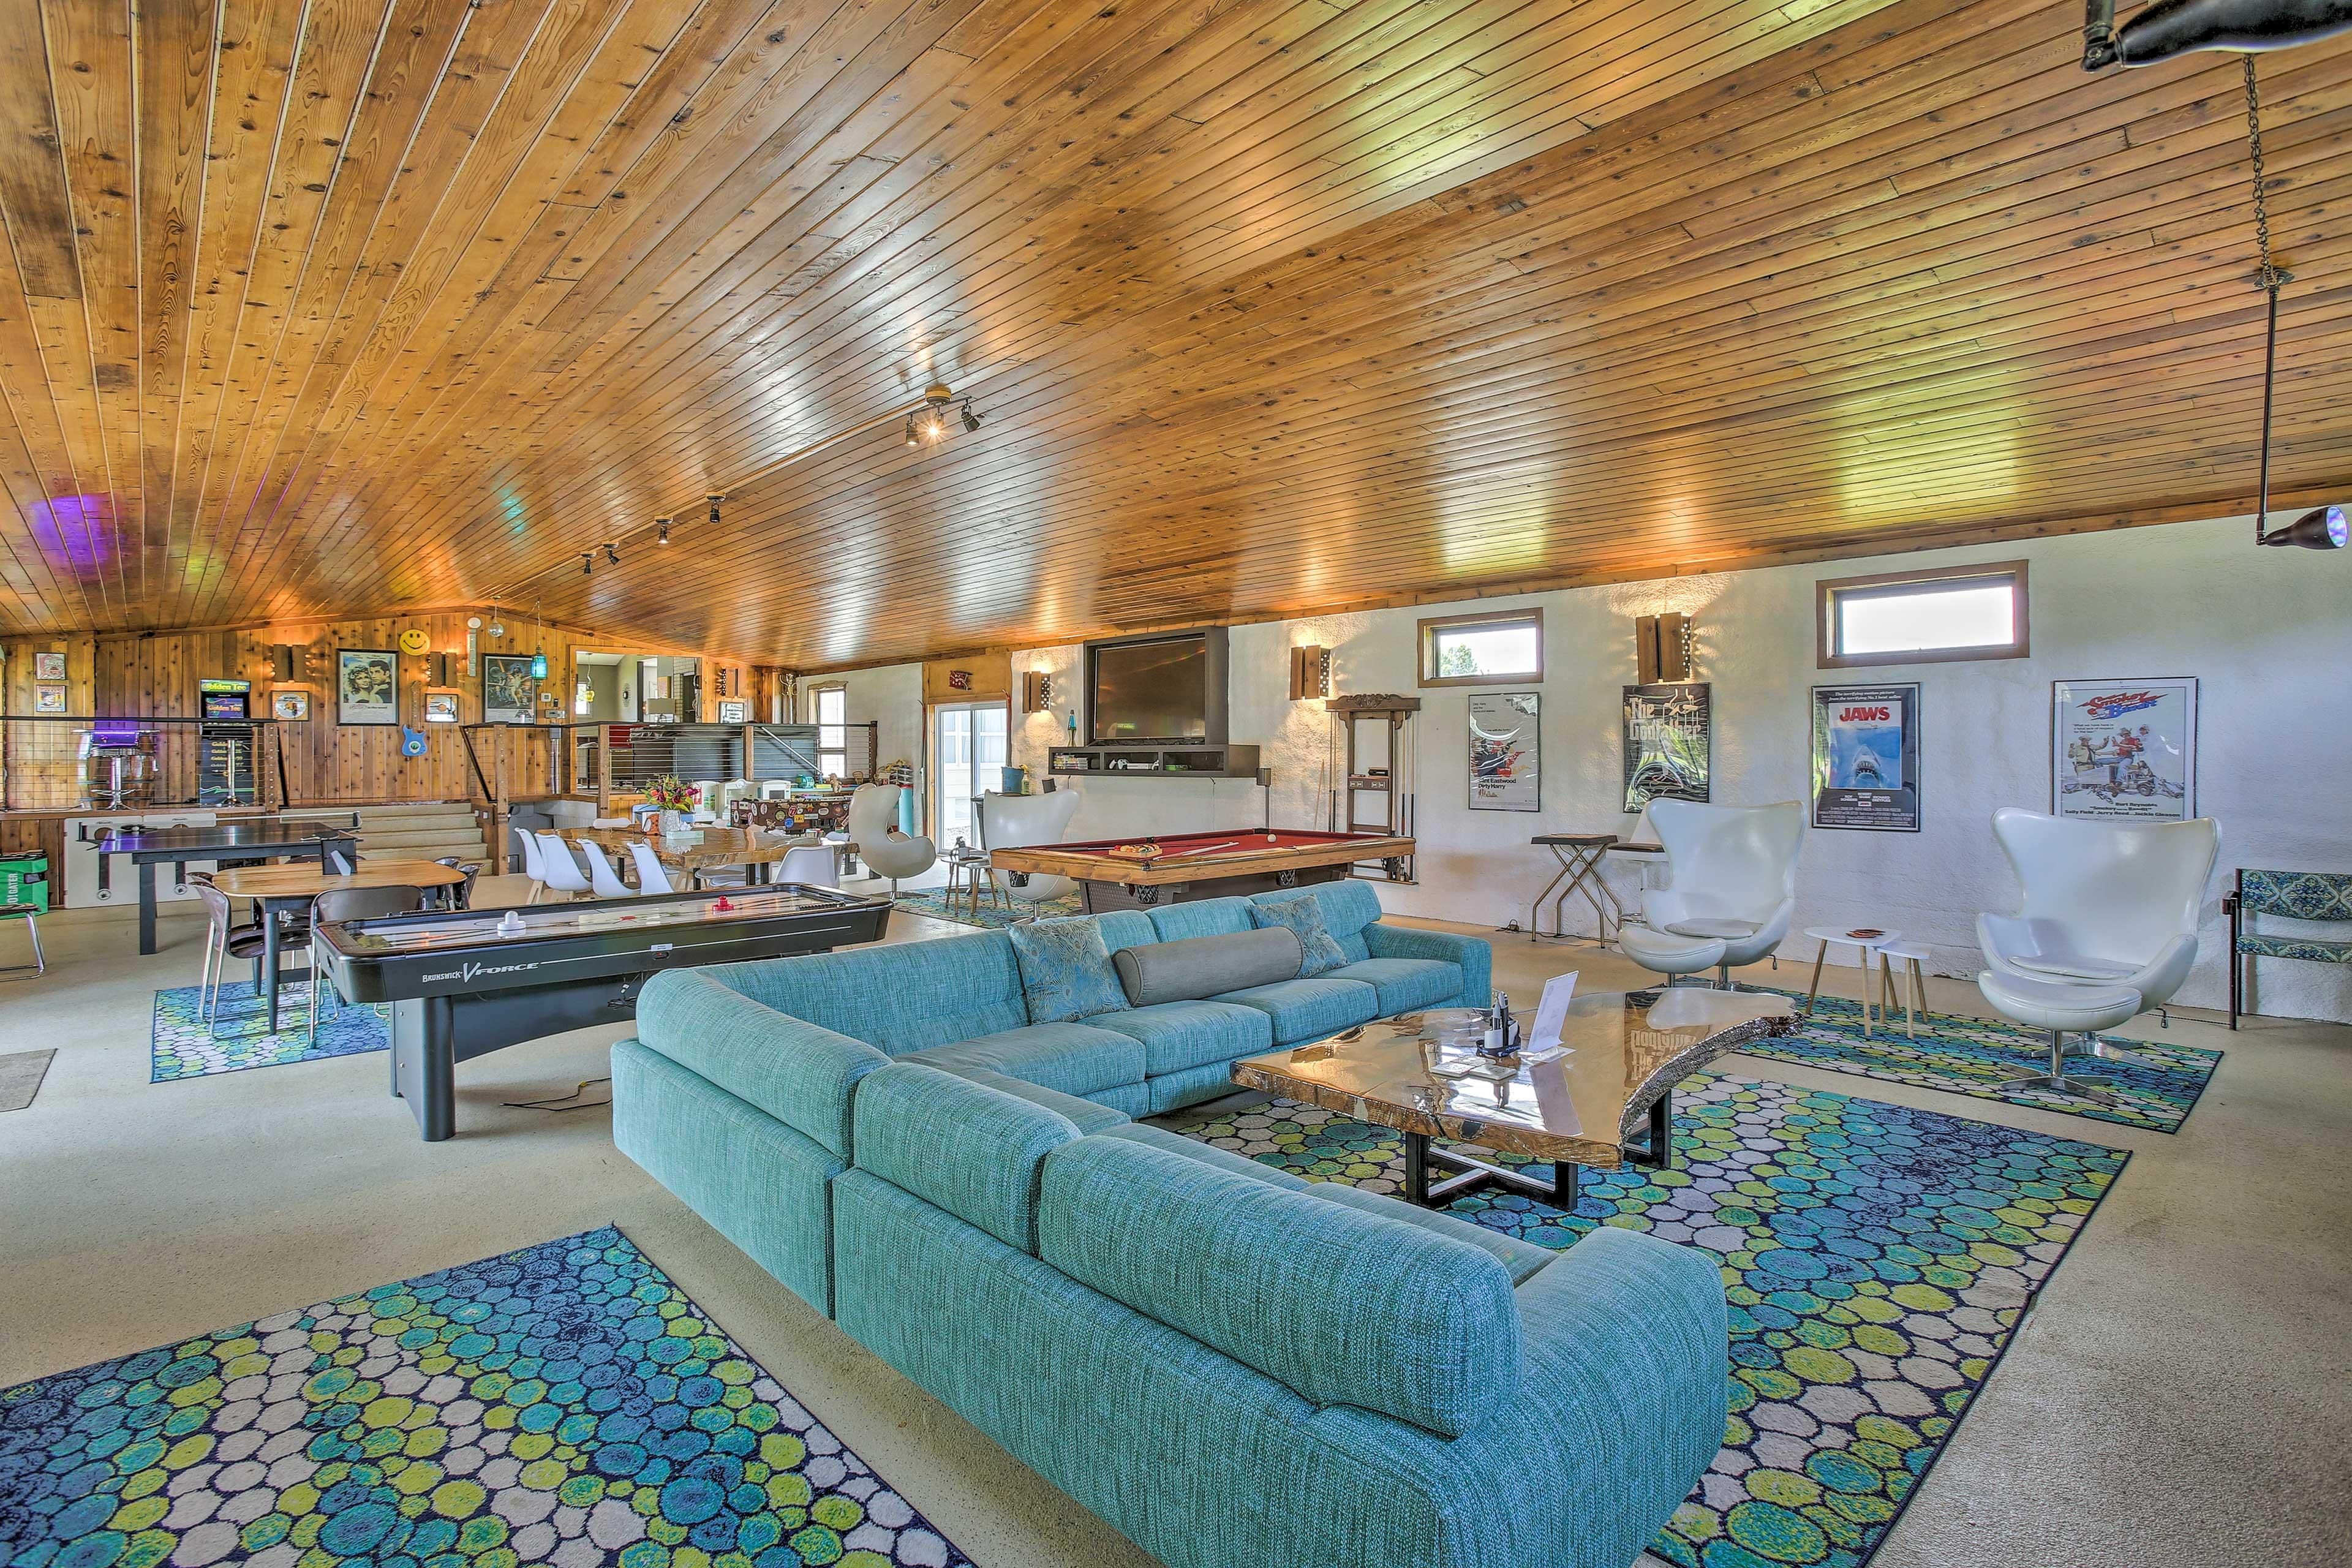 Traverse City Vacation Rental | 3BR | 4BA | Tiny Home w/ Loft +1BA | 4,000 Sq Ft